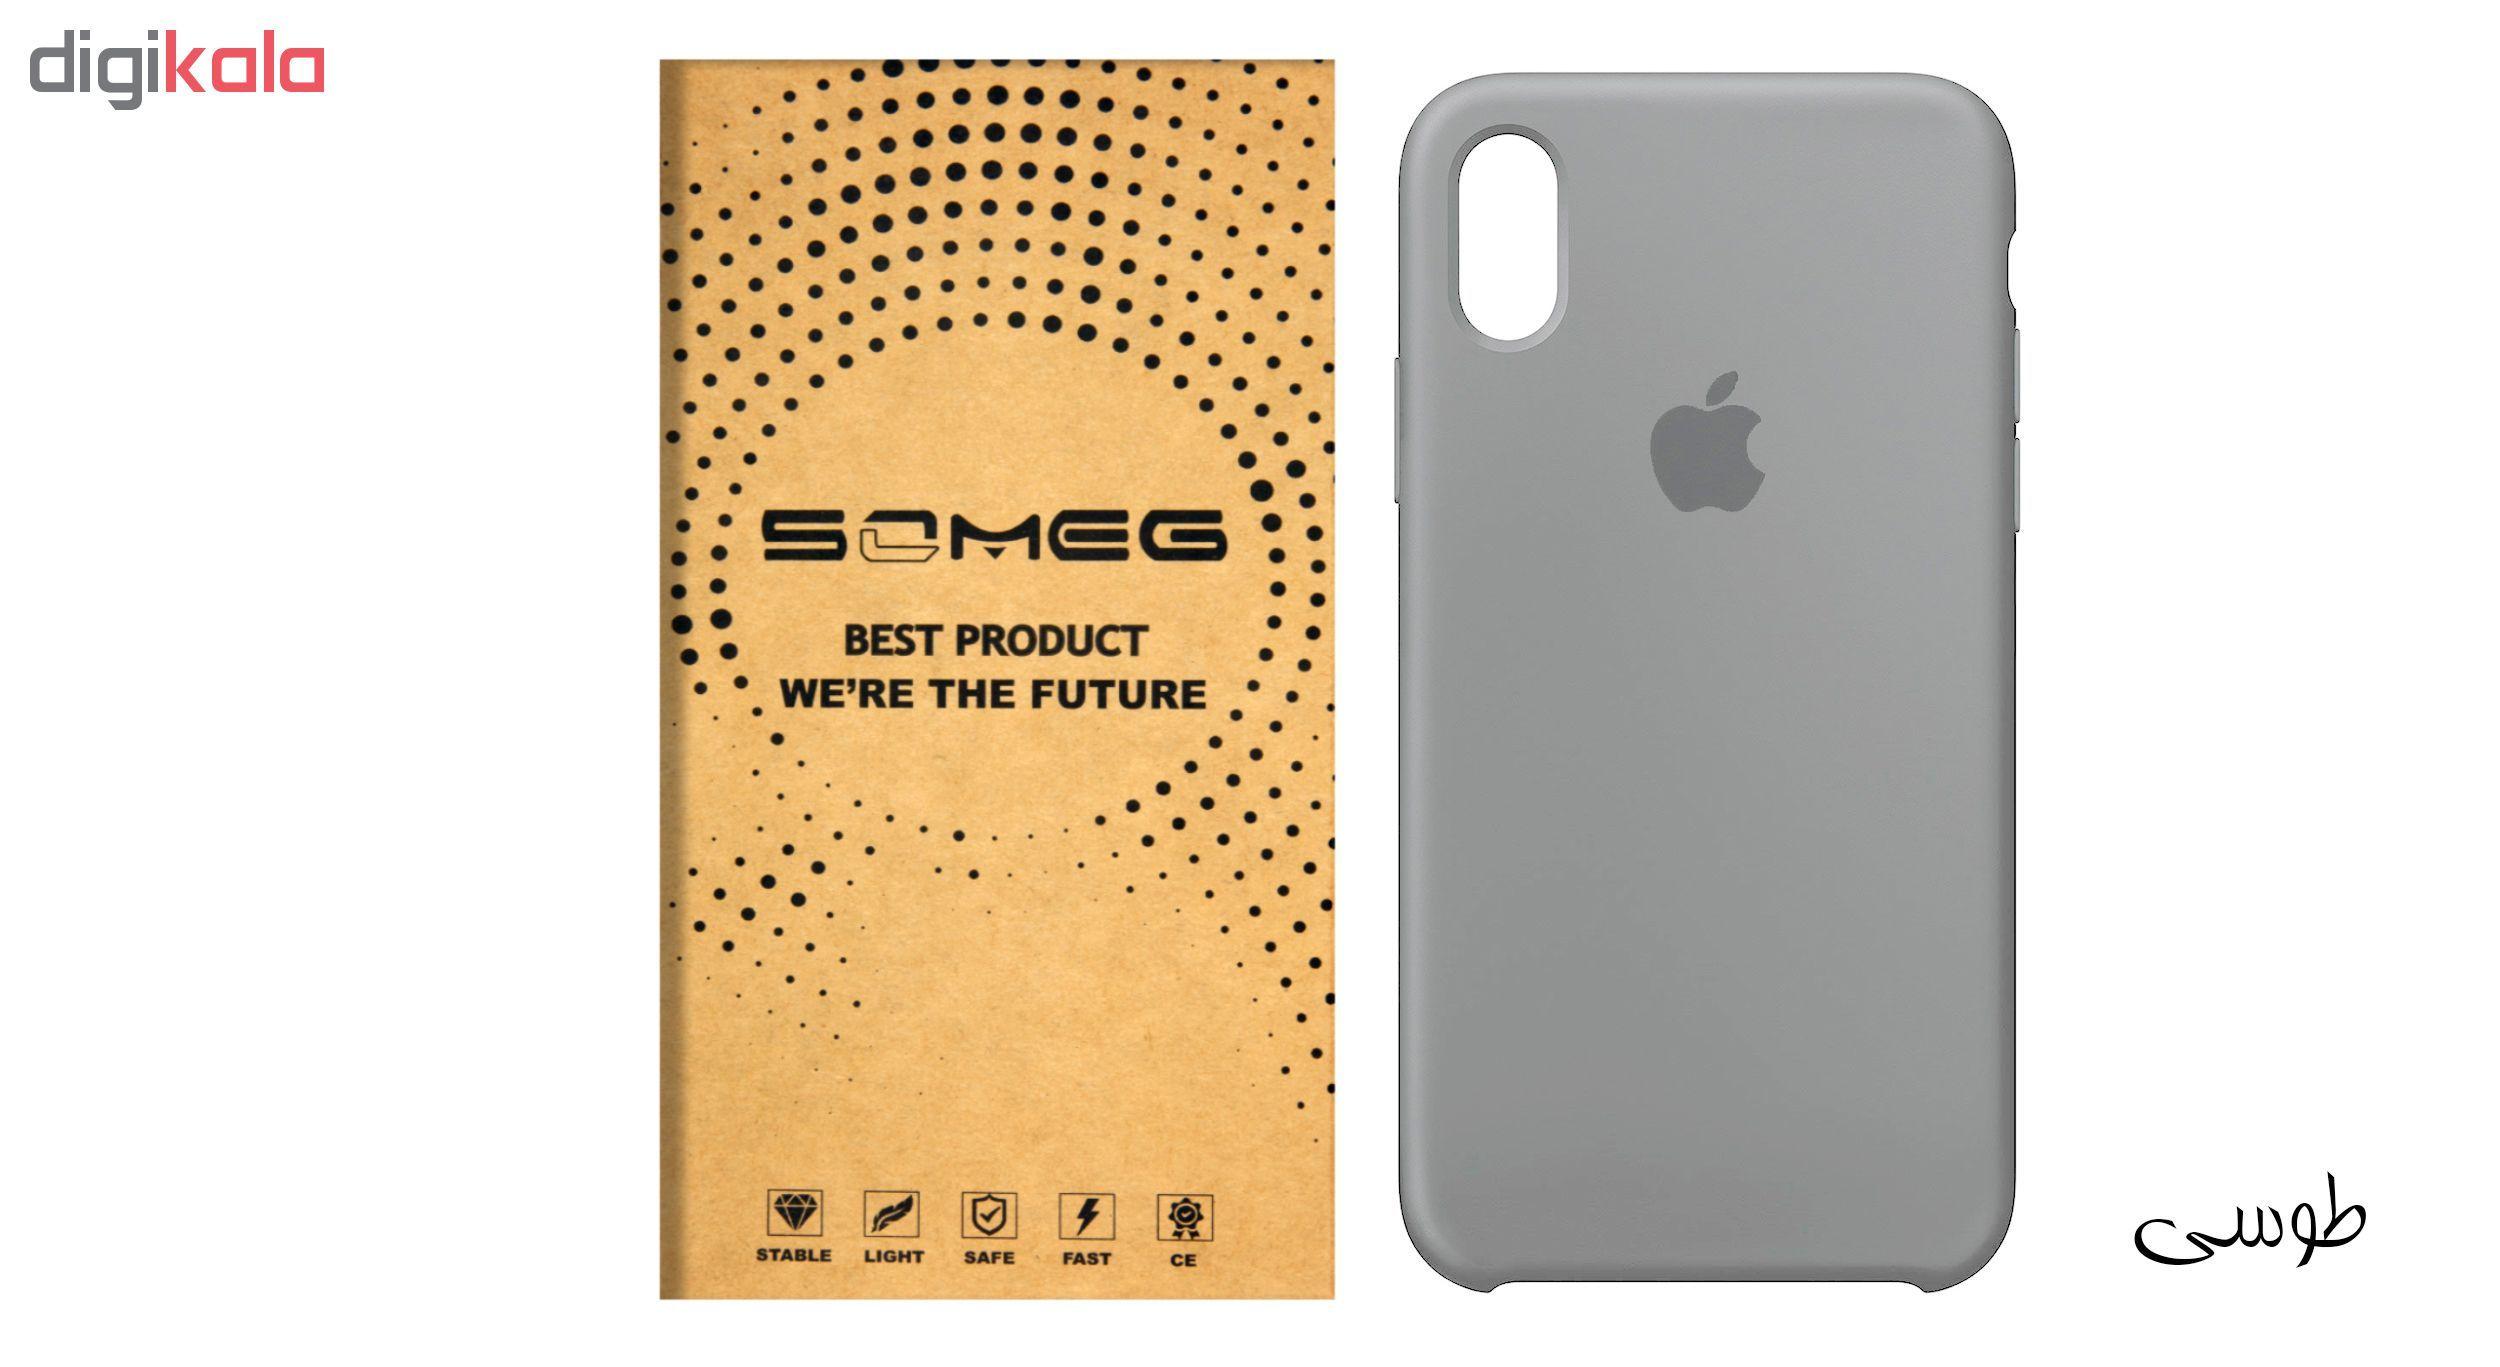 کاور سومگ مدل SIC مناسب برای گوشی موبایل اپل iPhone X  main 1 30